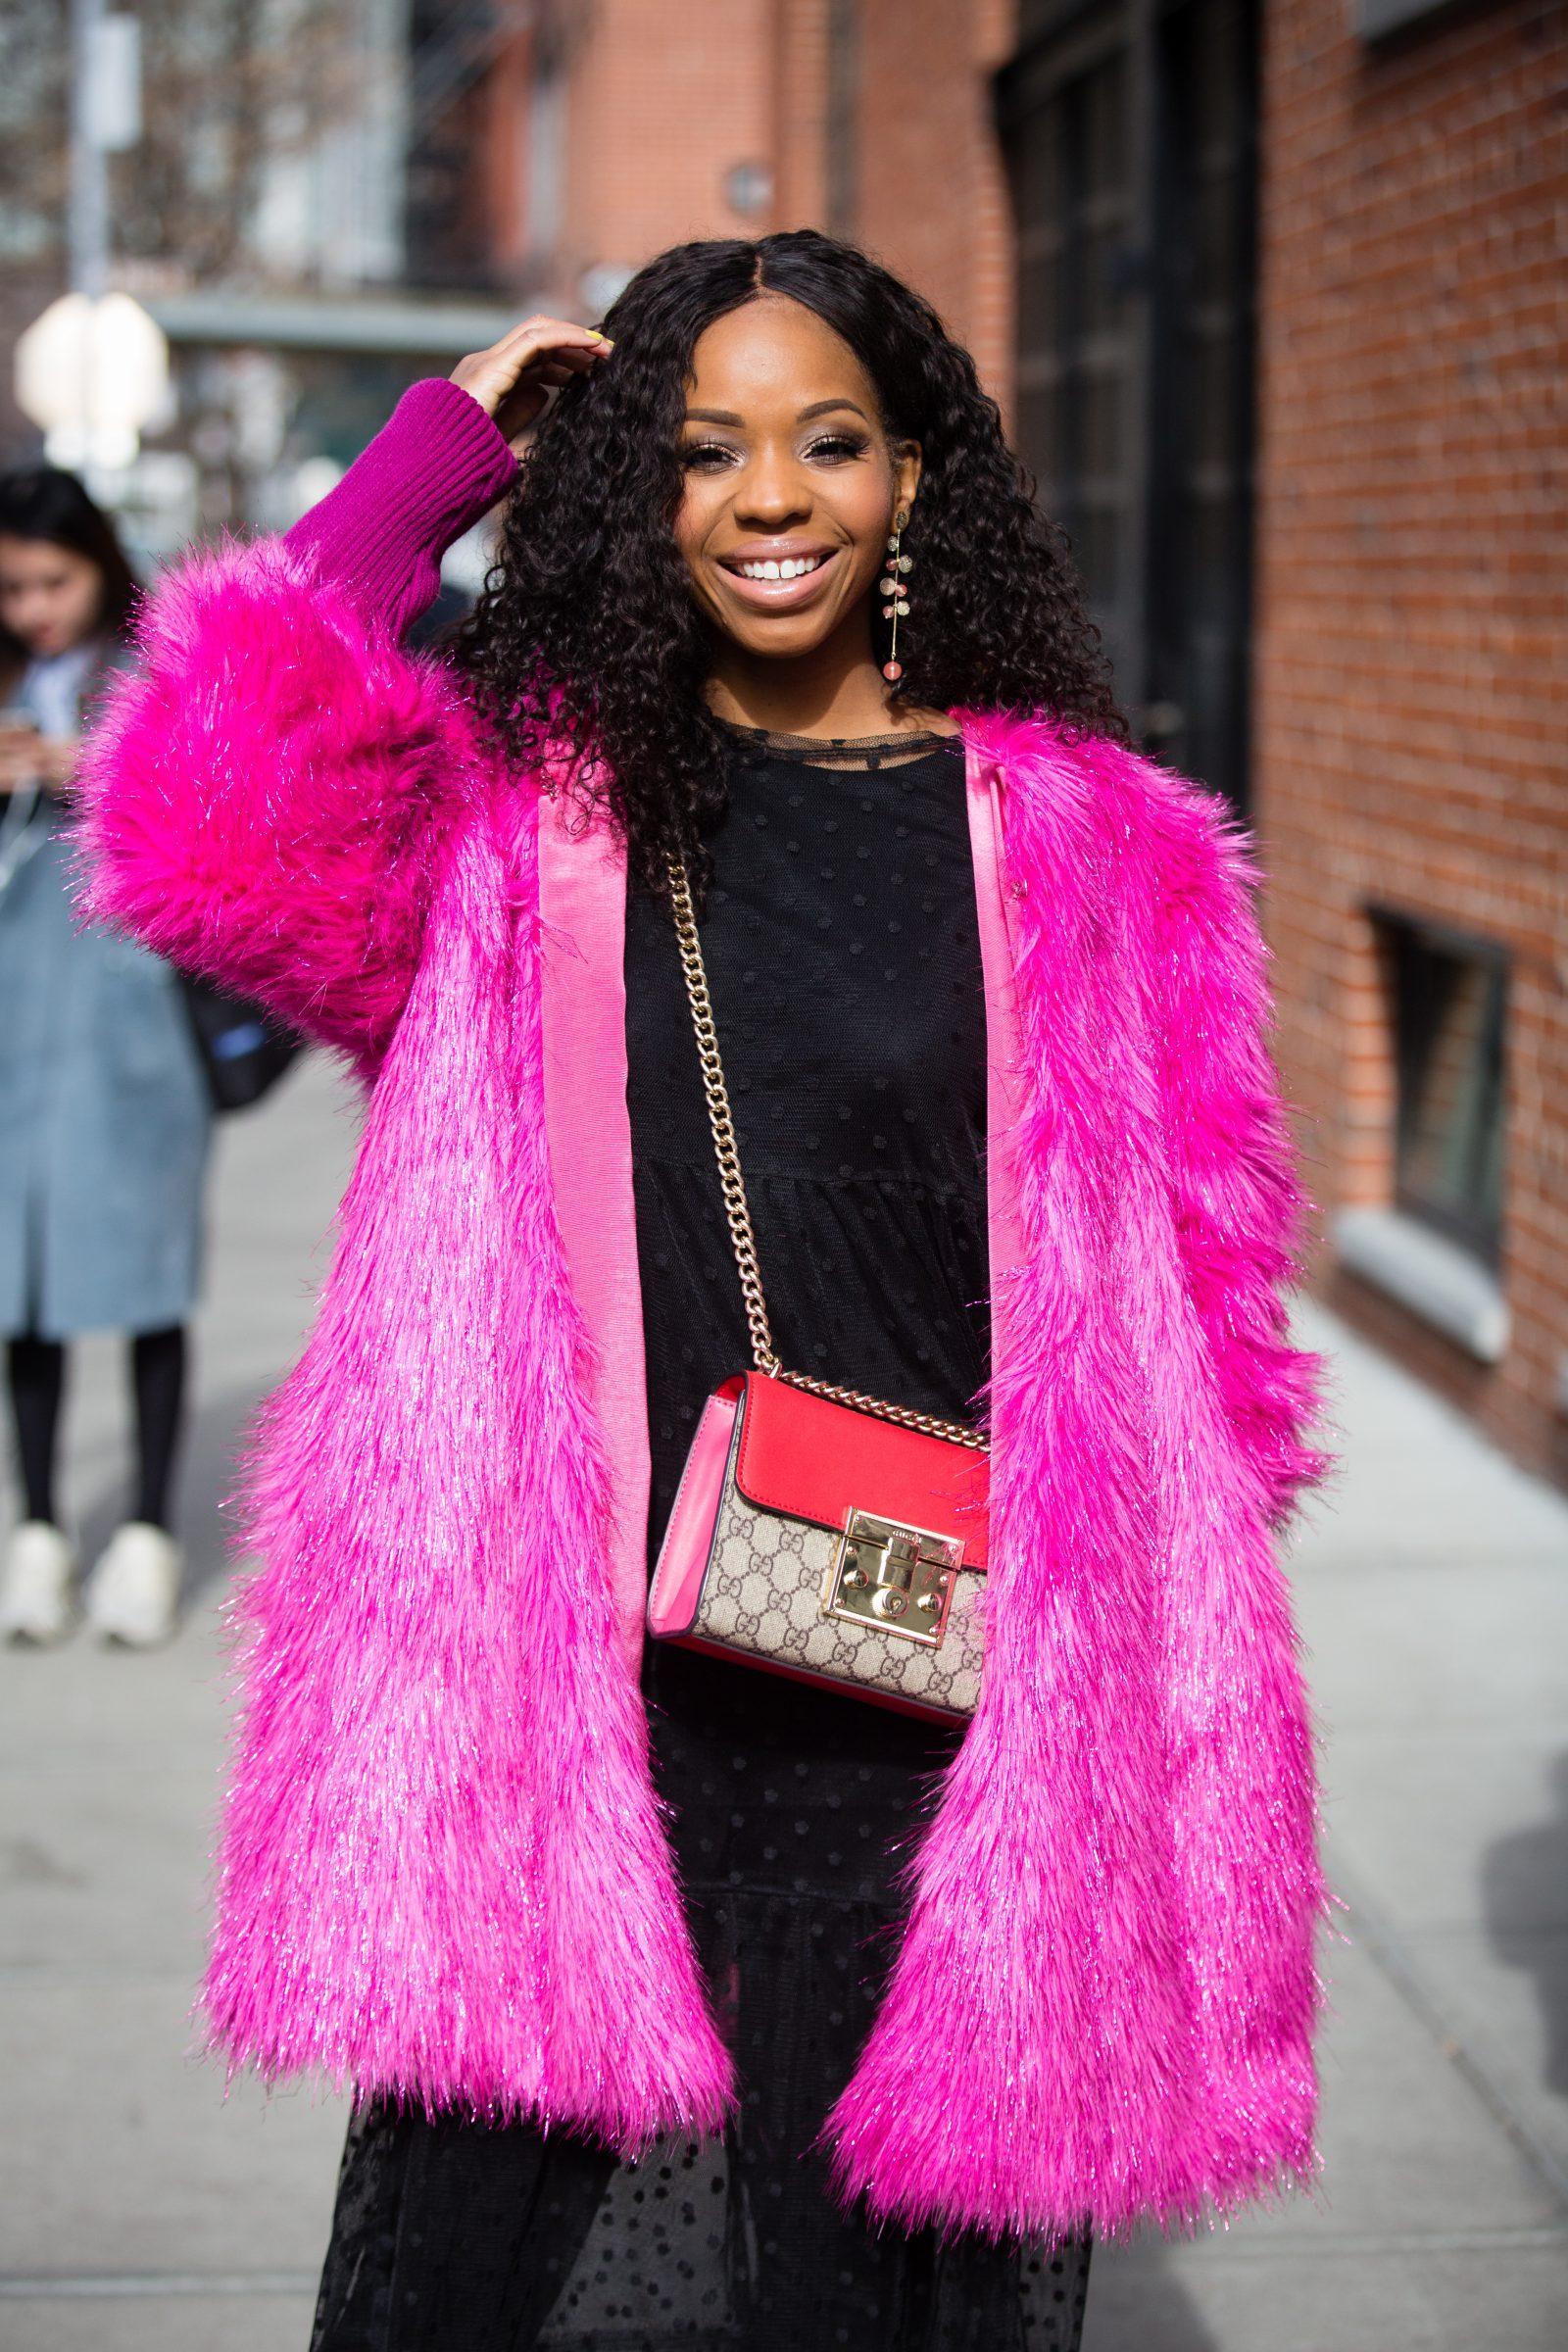 3971847fbc1dc2 Colorful street style at New York Fashion Week – The Buffalo News